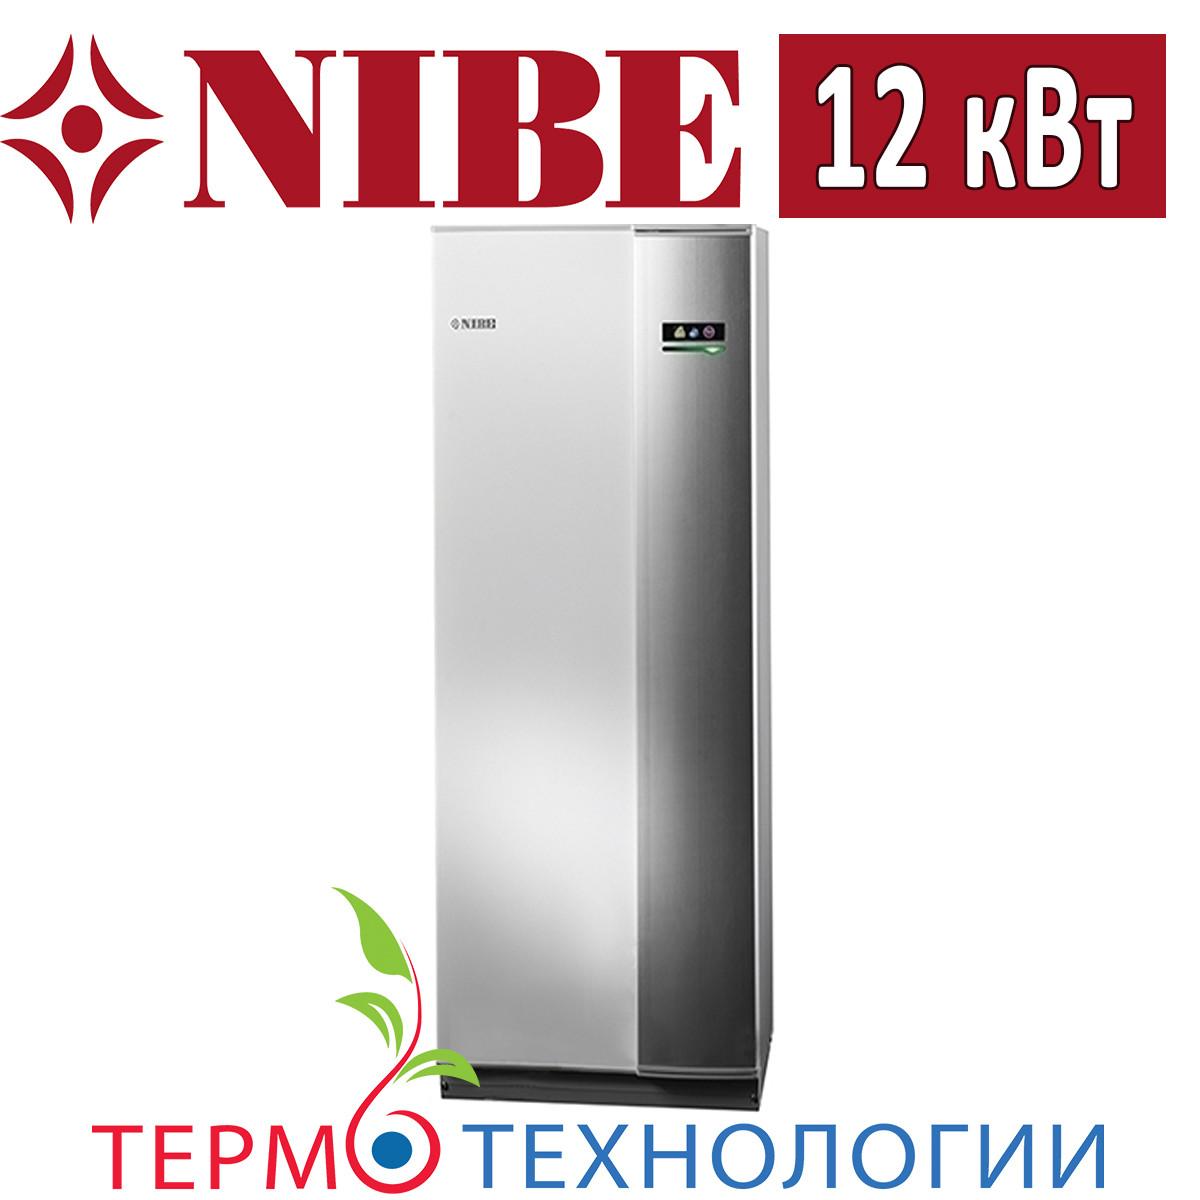 Тепловой насос грунт-вода Nibe F1255-12 R 12 кВт, 230 В